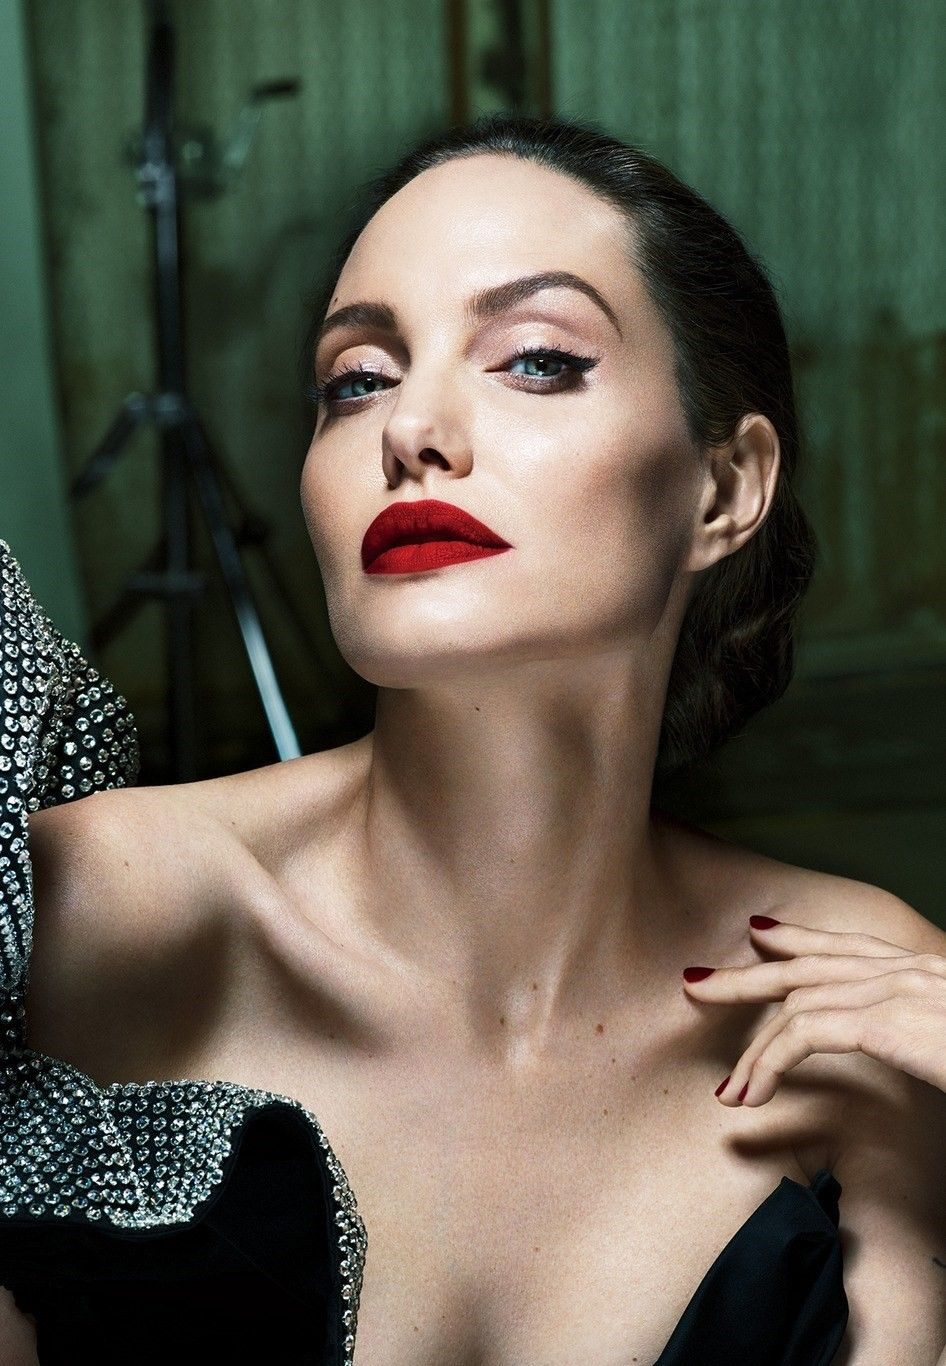 Angelina jolie and natalie portman nu photos